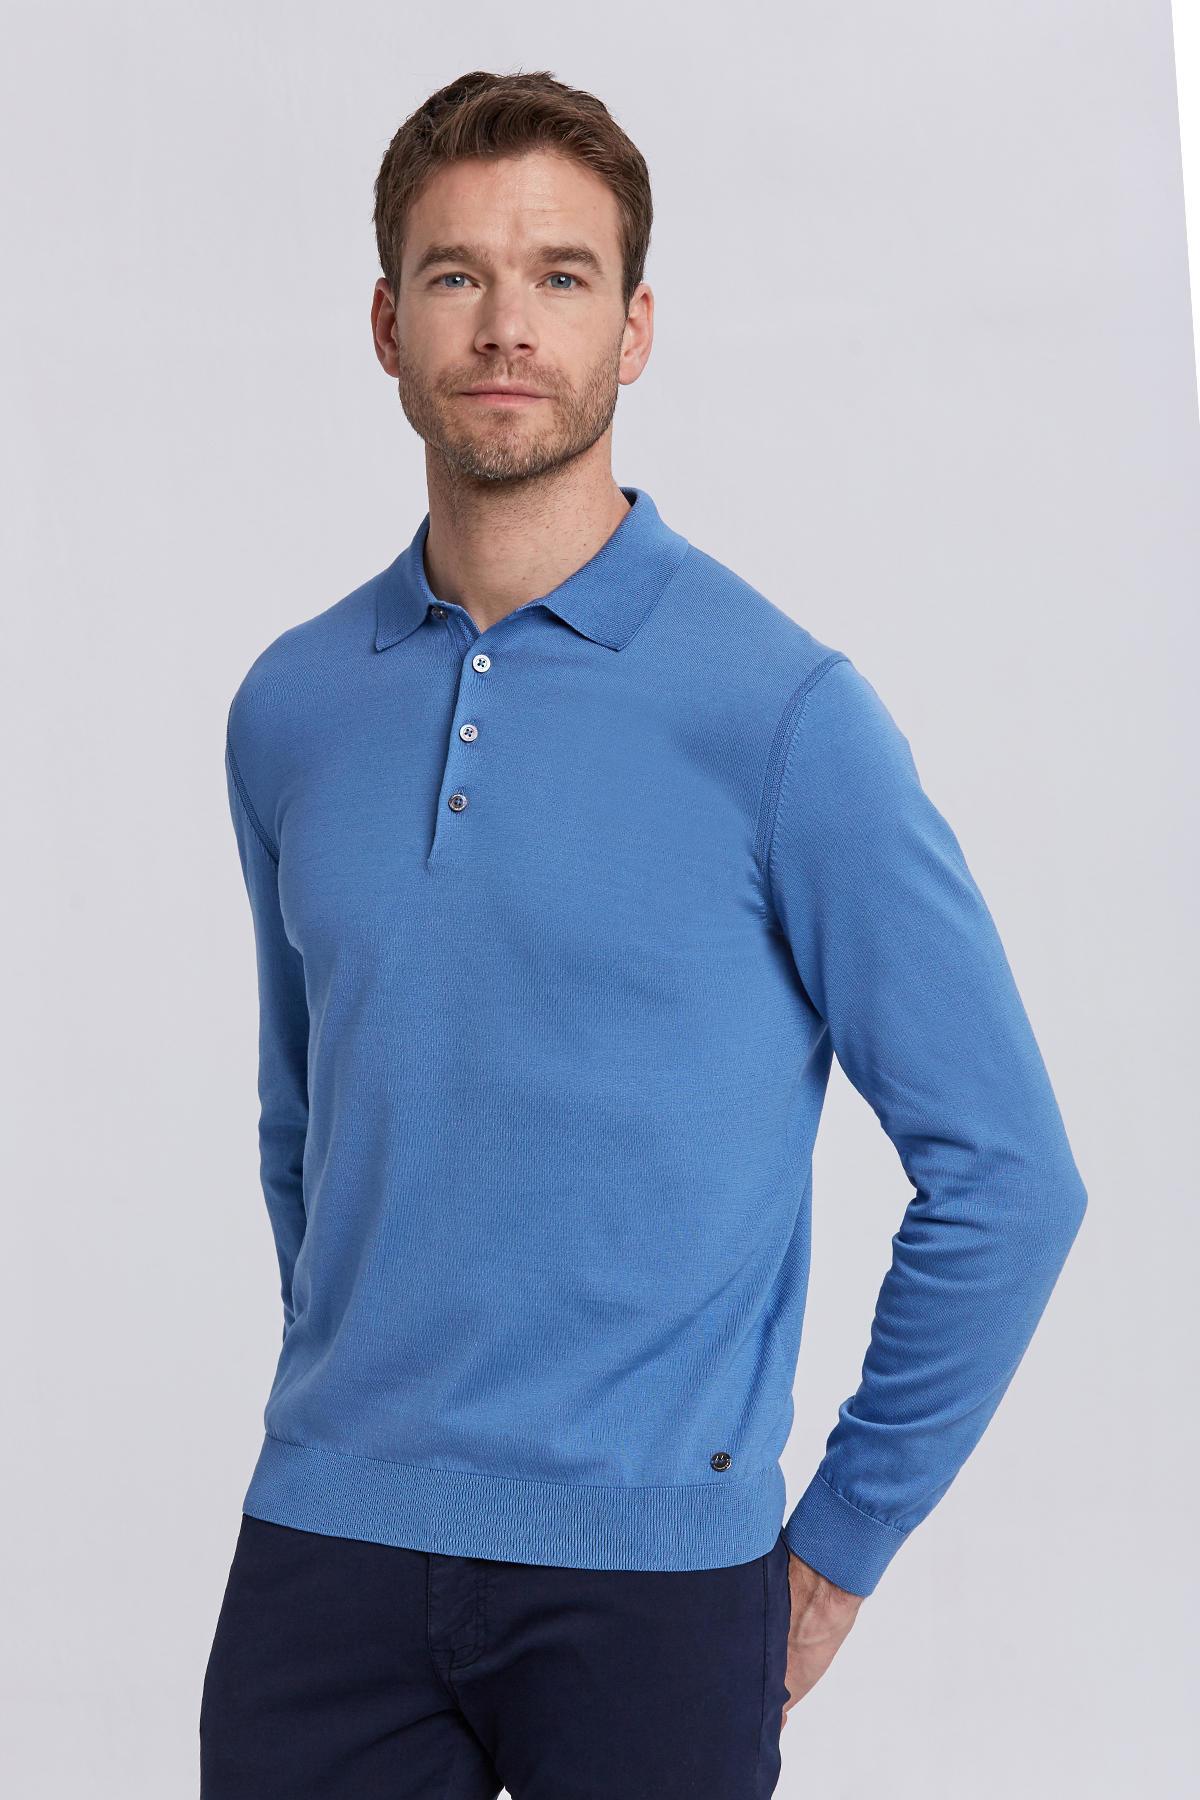 Mavi Polo Yaka Uzun Kollu Mevsimlik Triko